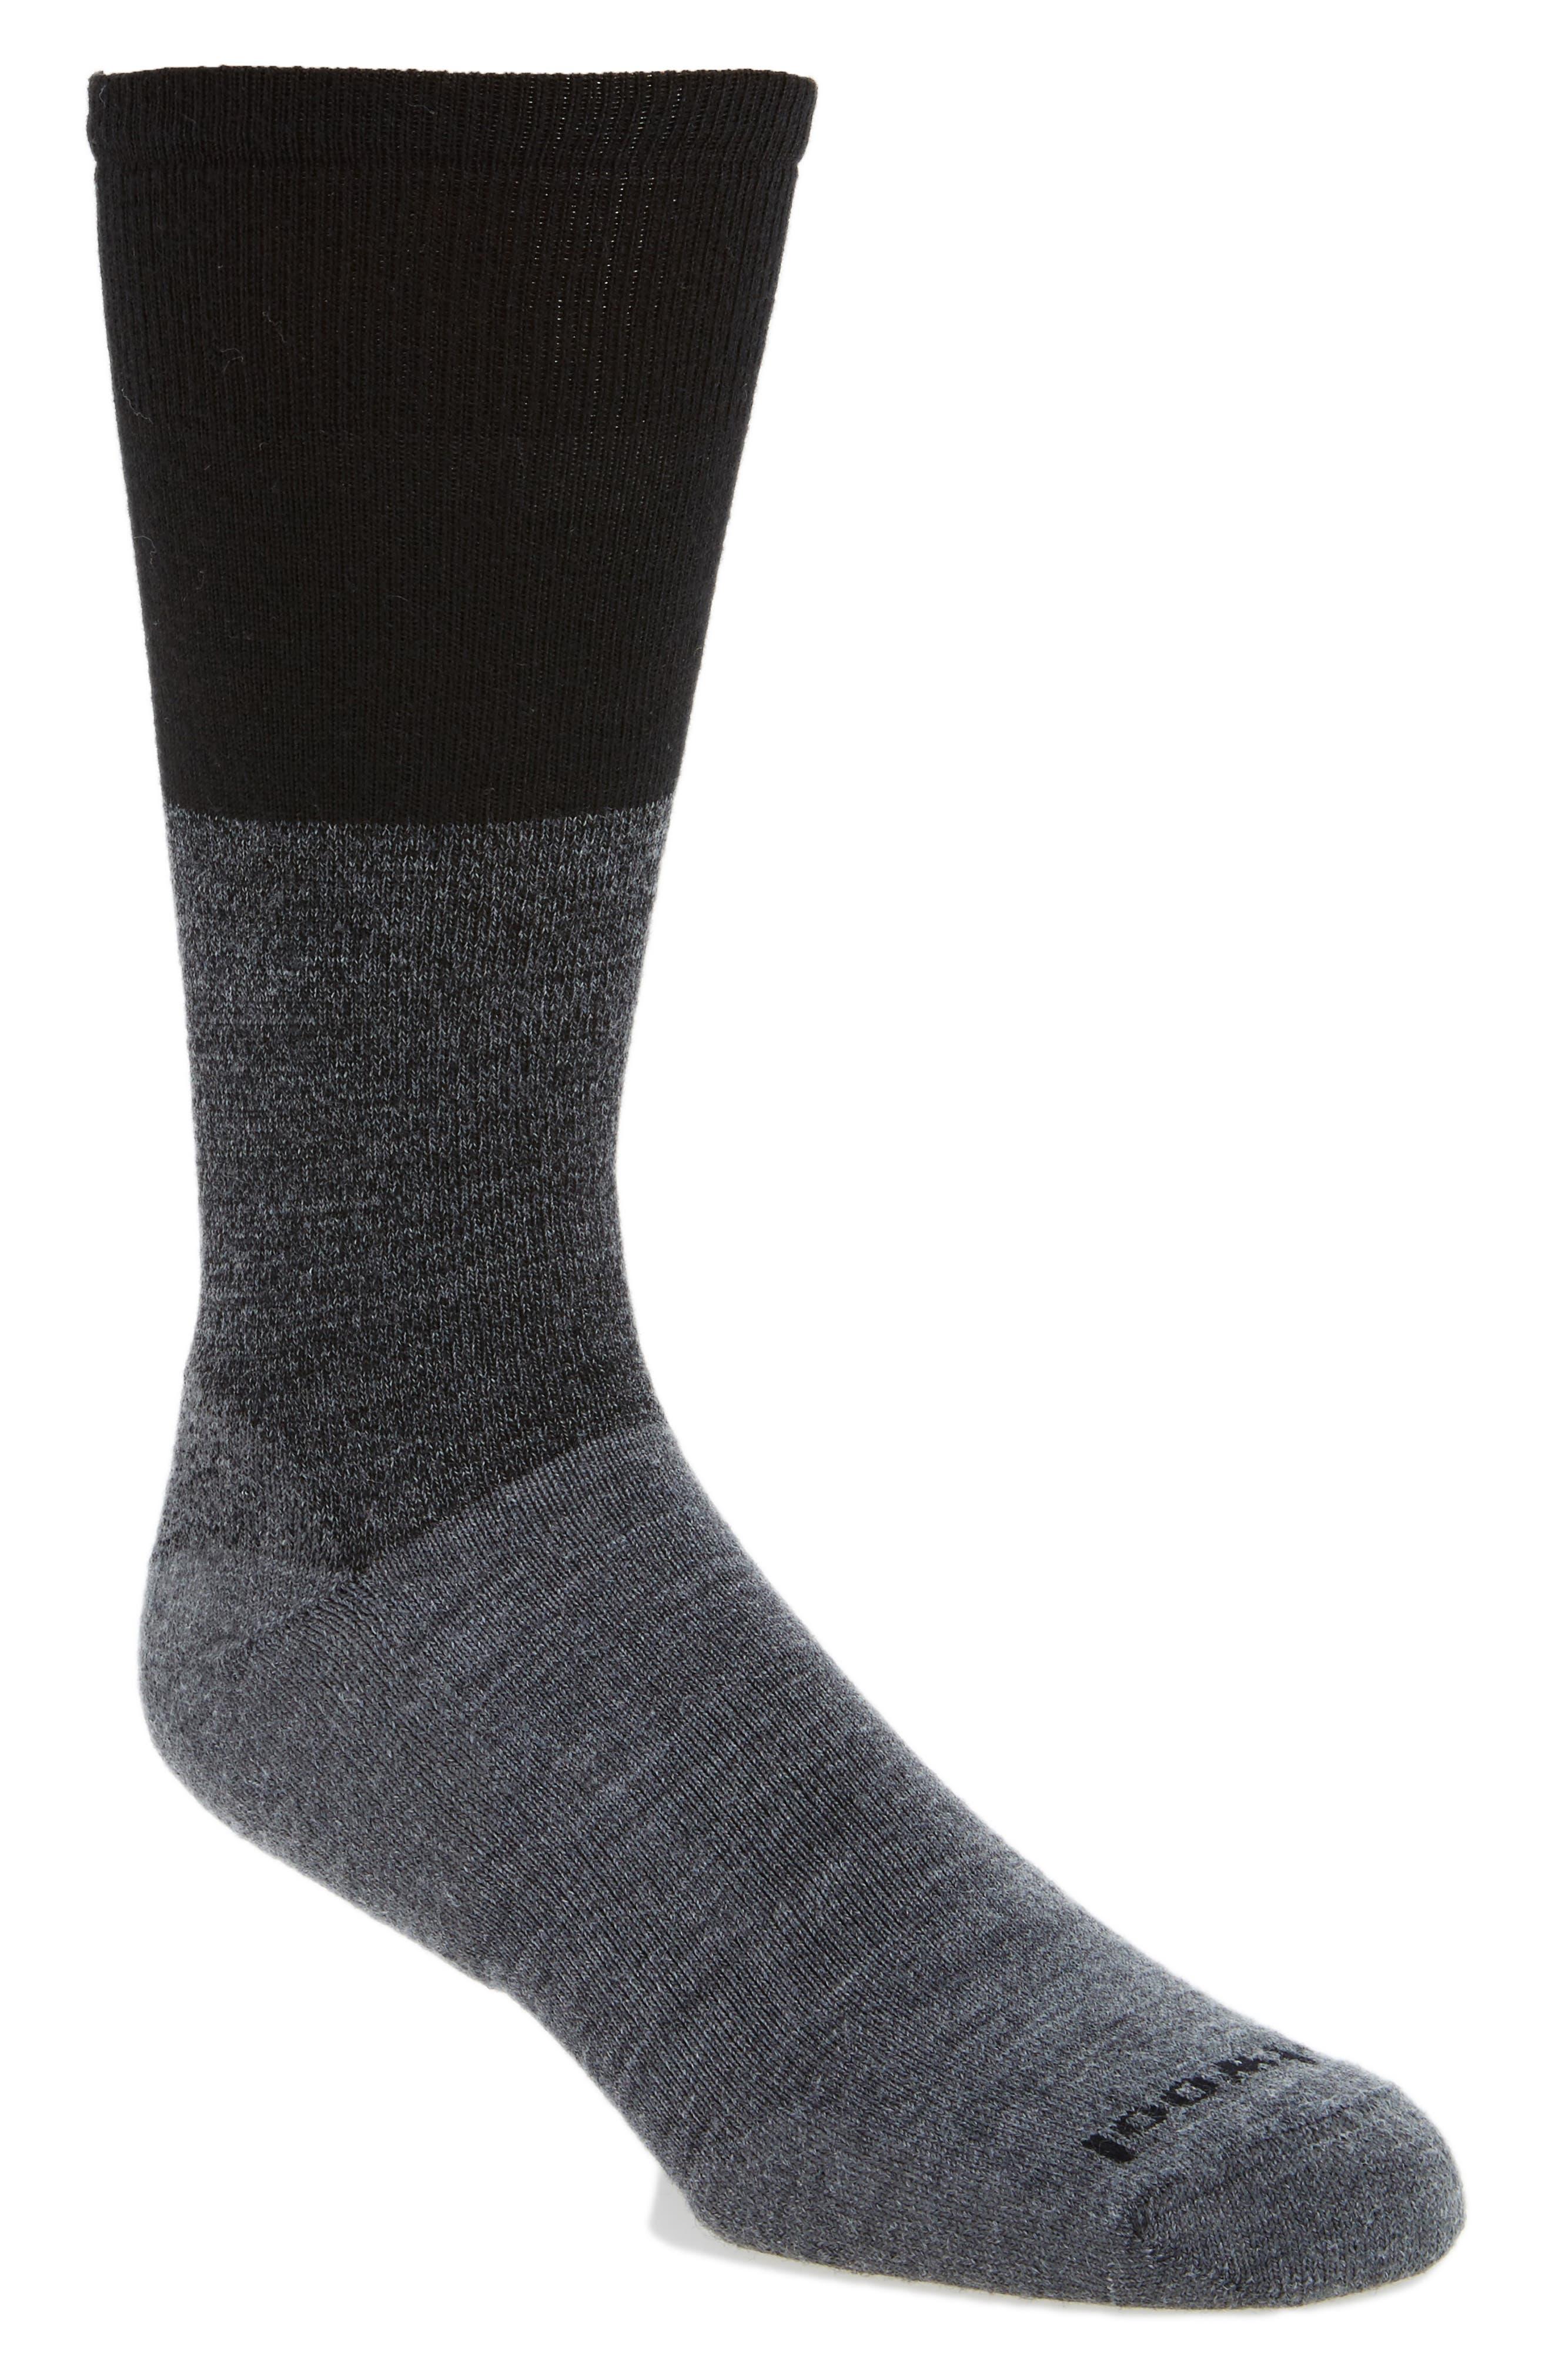 Faversham Colorblock Socks,                             Main thumbnail 1, color,                             030